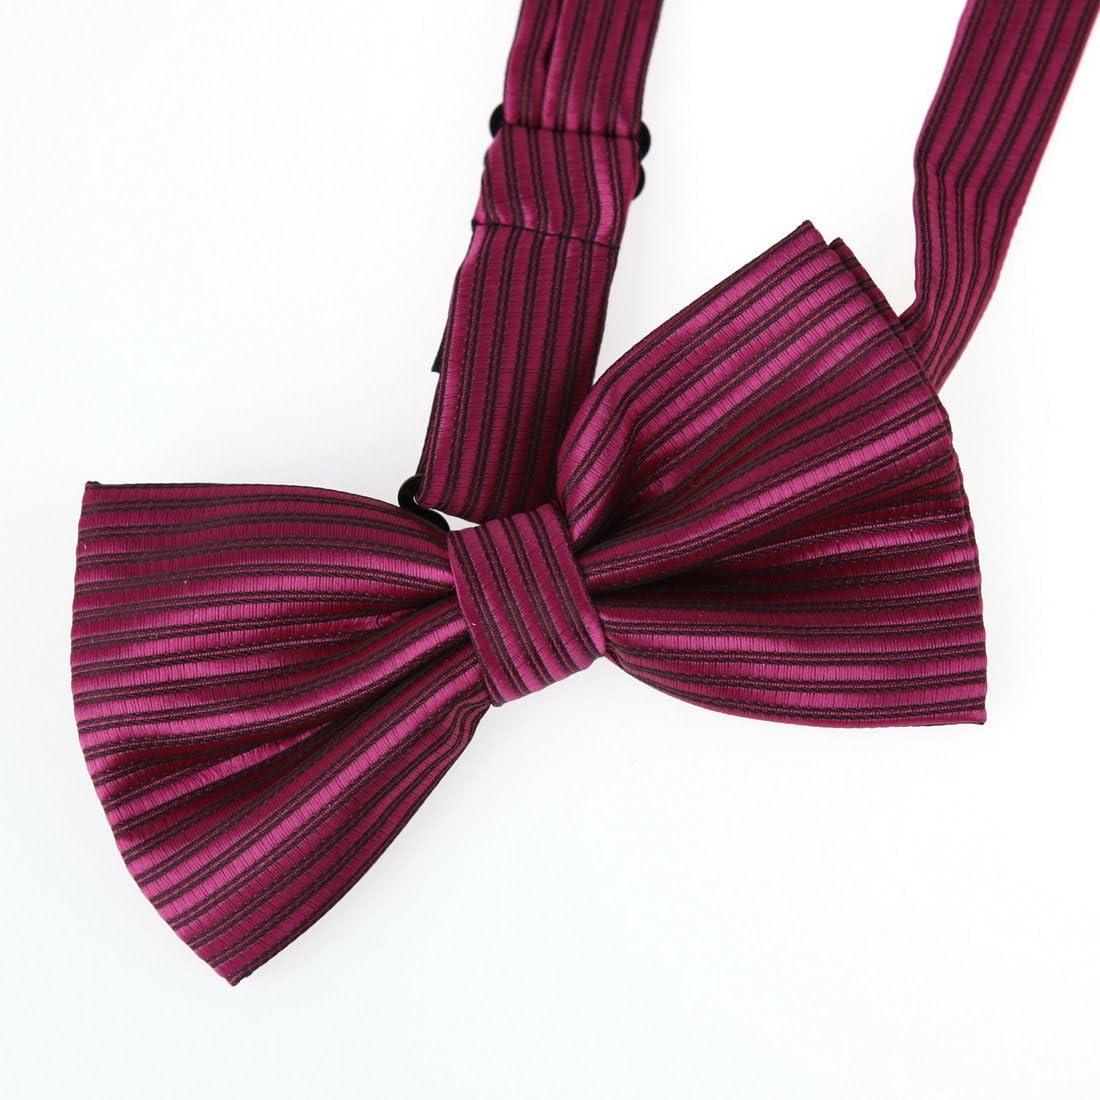 DBC2021 Black Bowtie For Marriage Black Pre-tied Bow tie By Dan Smith